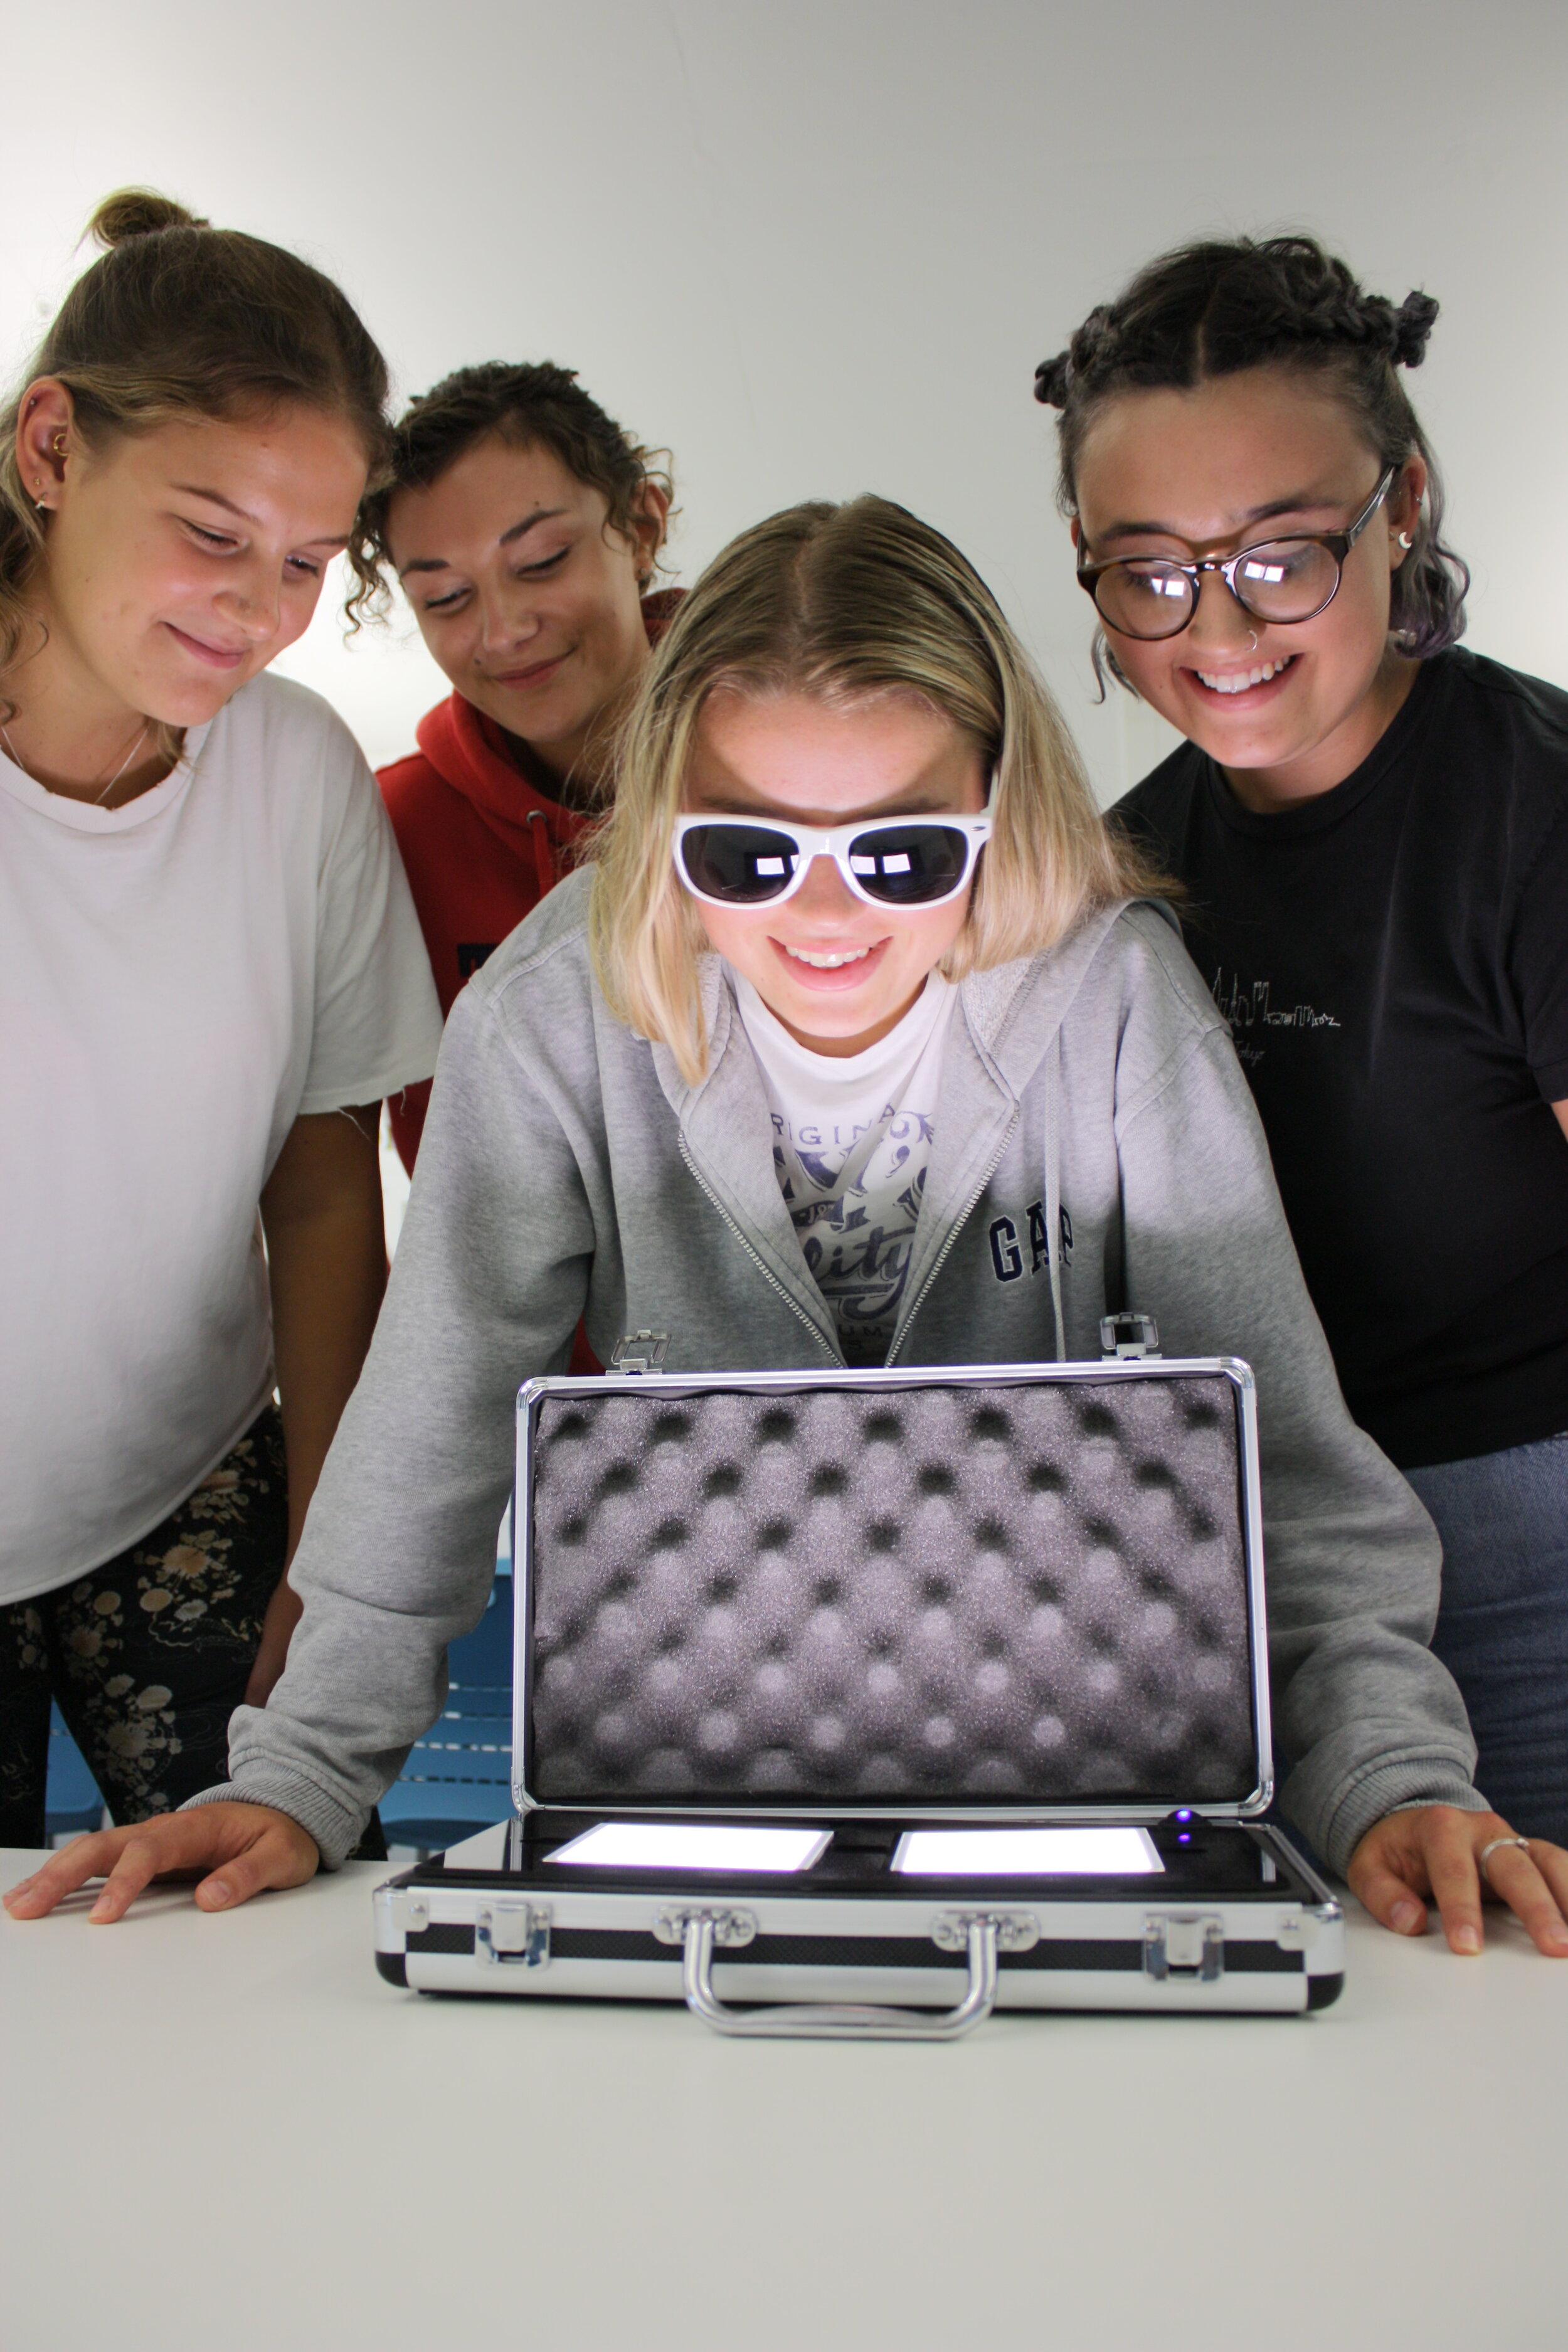 Millie White, Sophie Wilson, Zoe Mercer and Jess Logan- all Product Design students at Brunel University London.